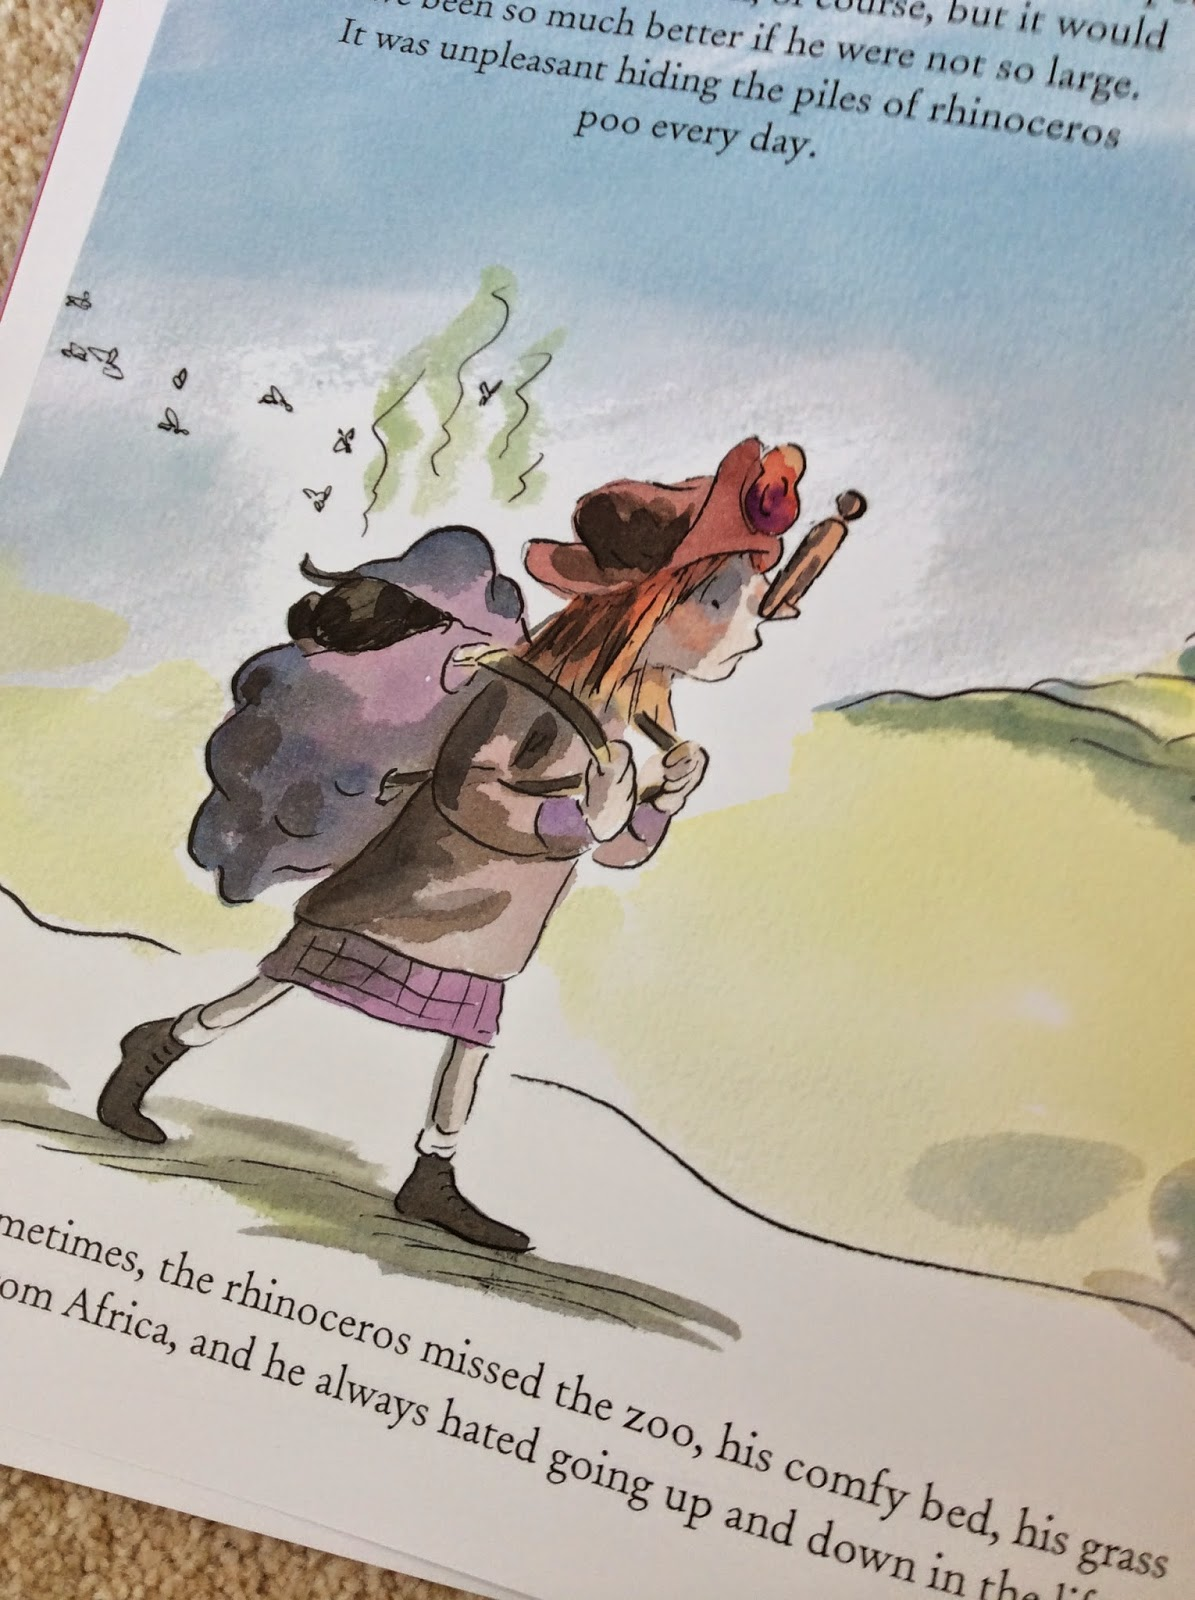 Hiding rhinoceros poo. Illustration from Rita's Rhino by Tony Ross